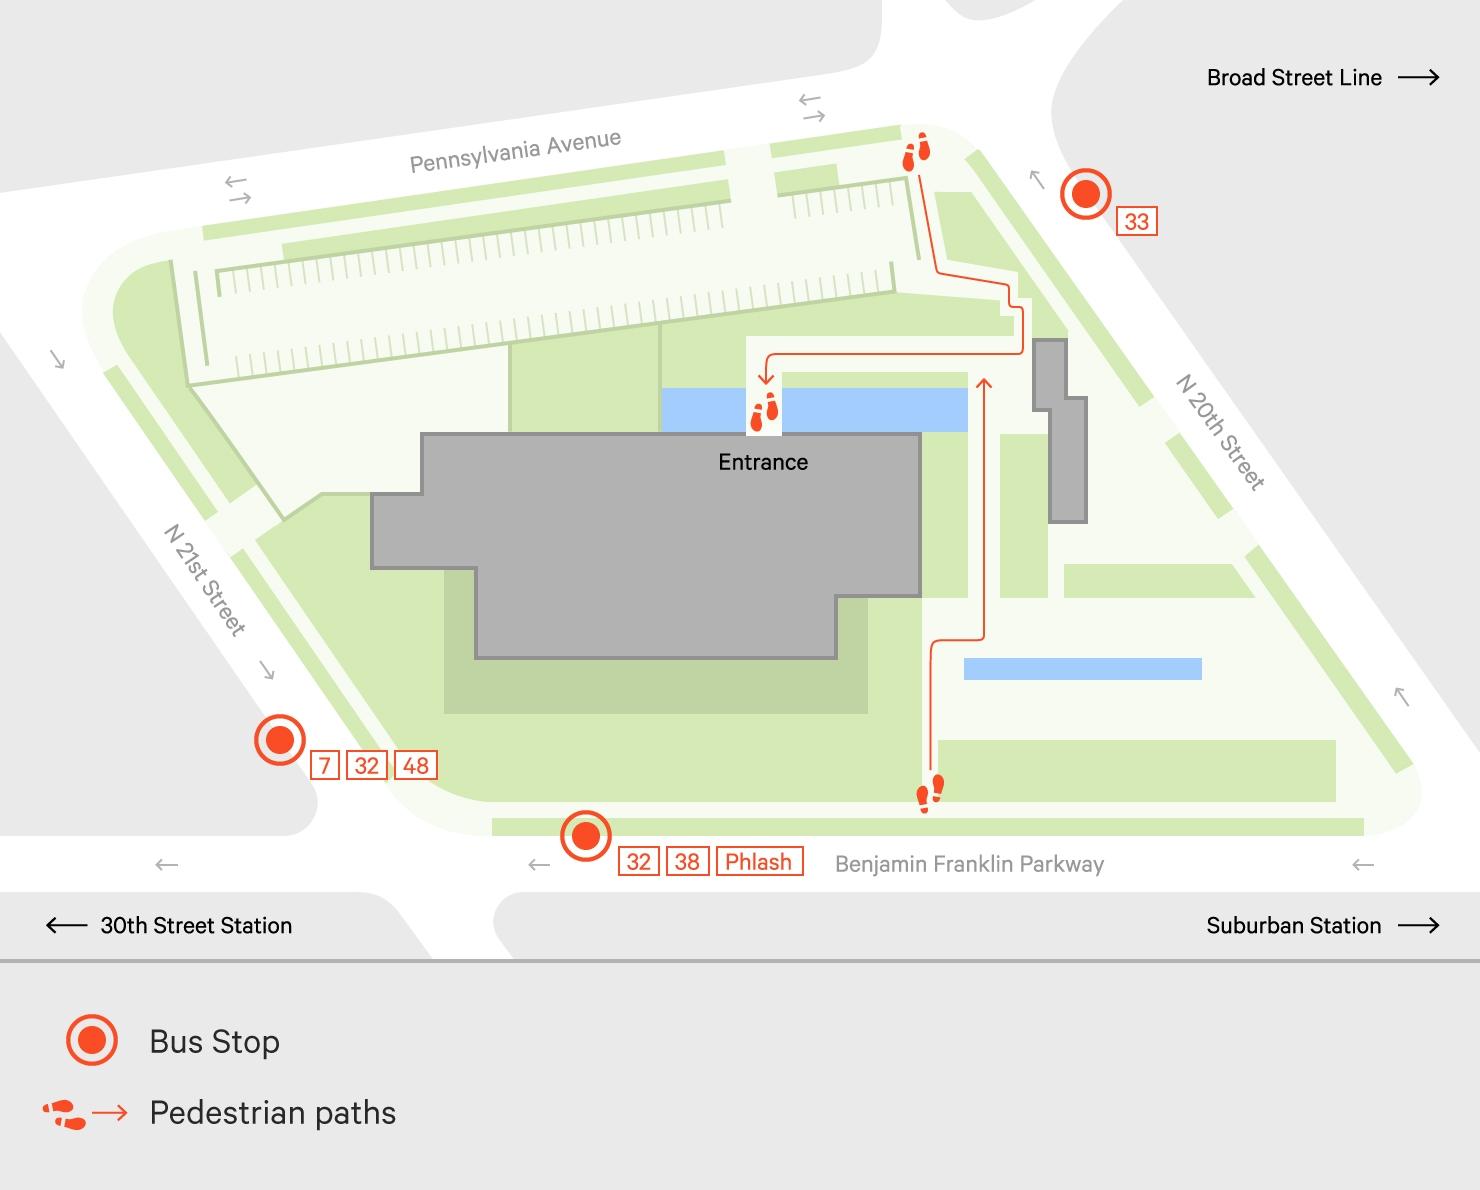 barnes_map_OSV_Jul27_v2-Pedestrian.jpg#asset:2904